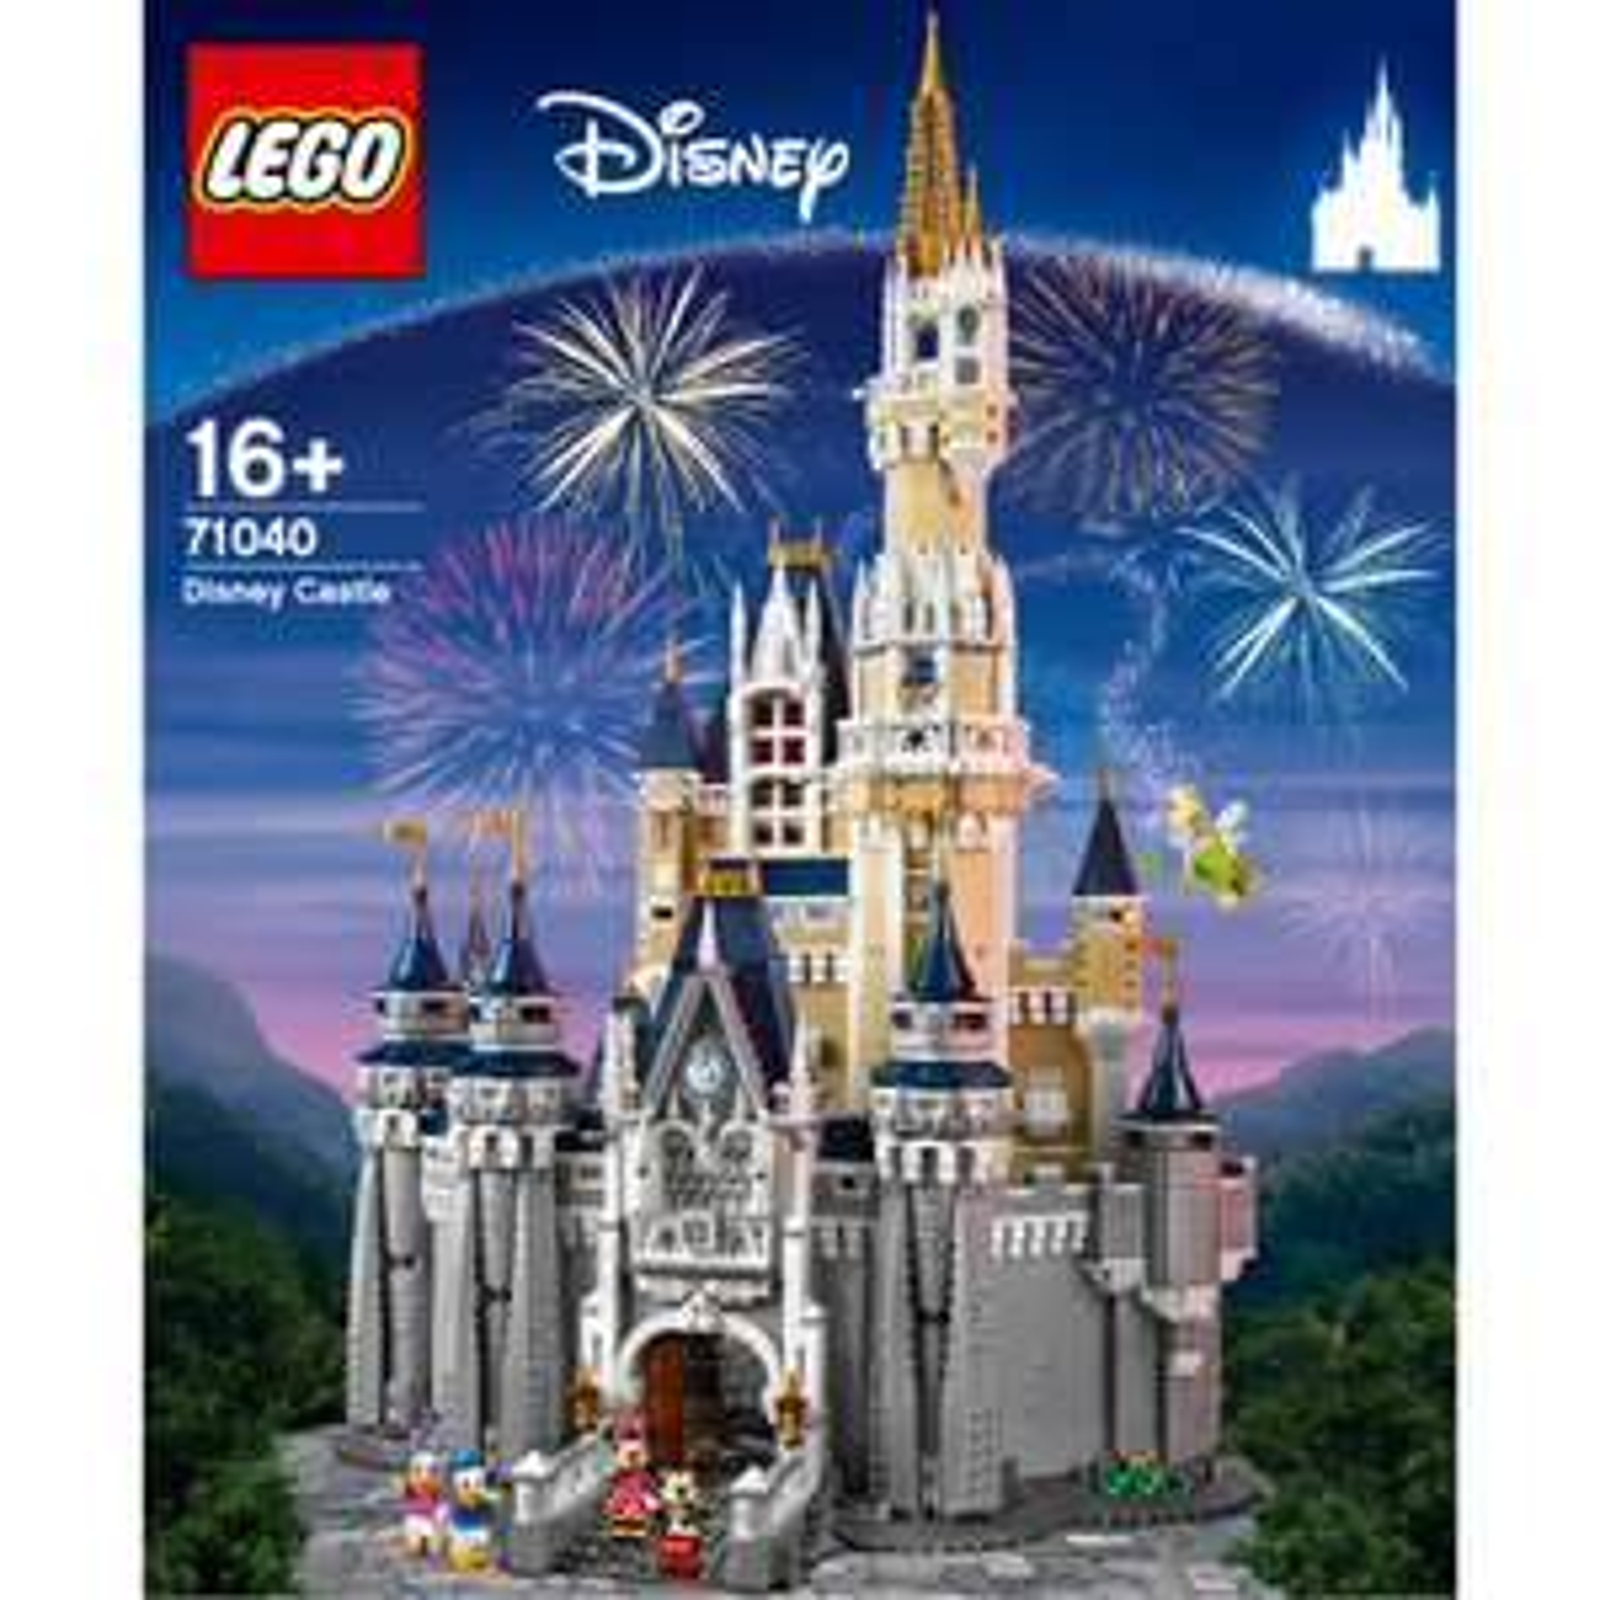 LEGO Disney: The Disney Castle 71040